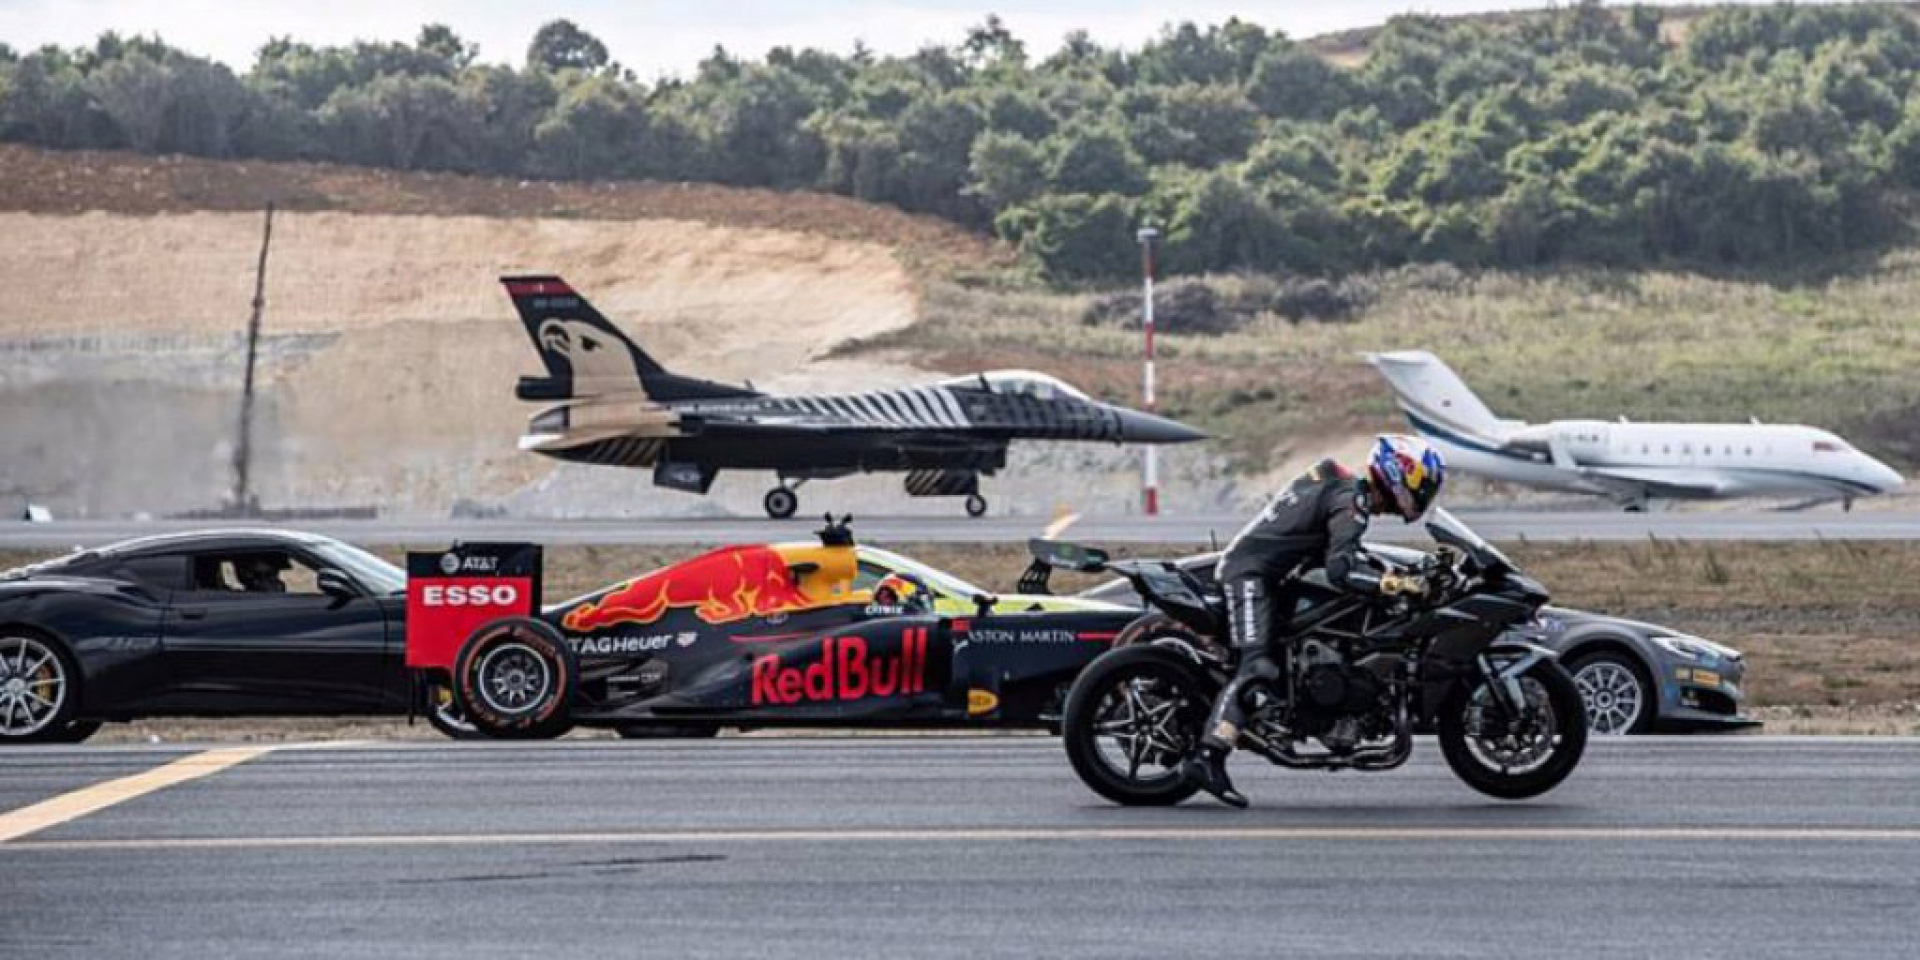 F1、H2R還有F16戰鬥機到底誰快?土耳其航空科技節測給你看!